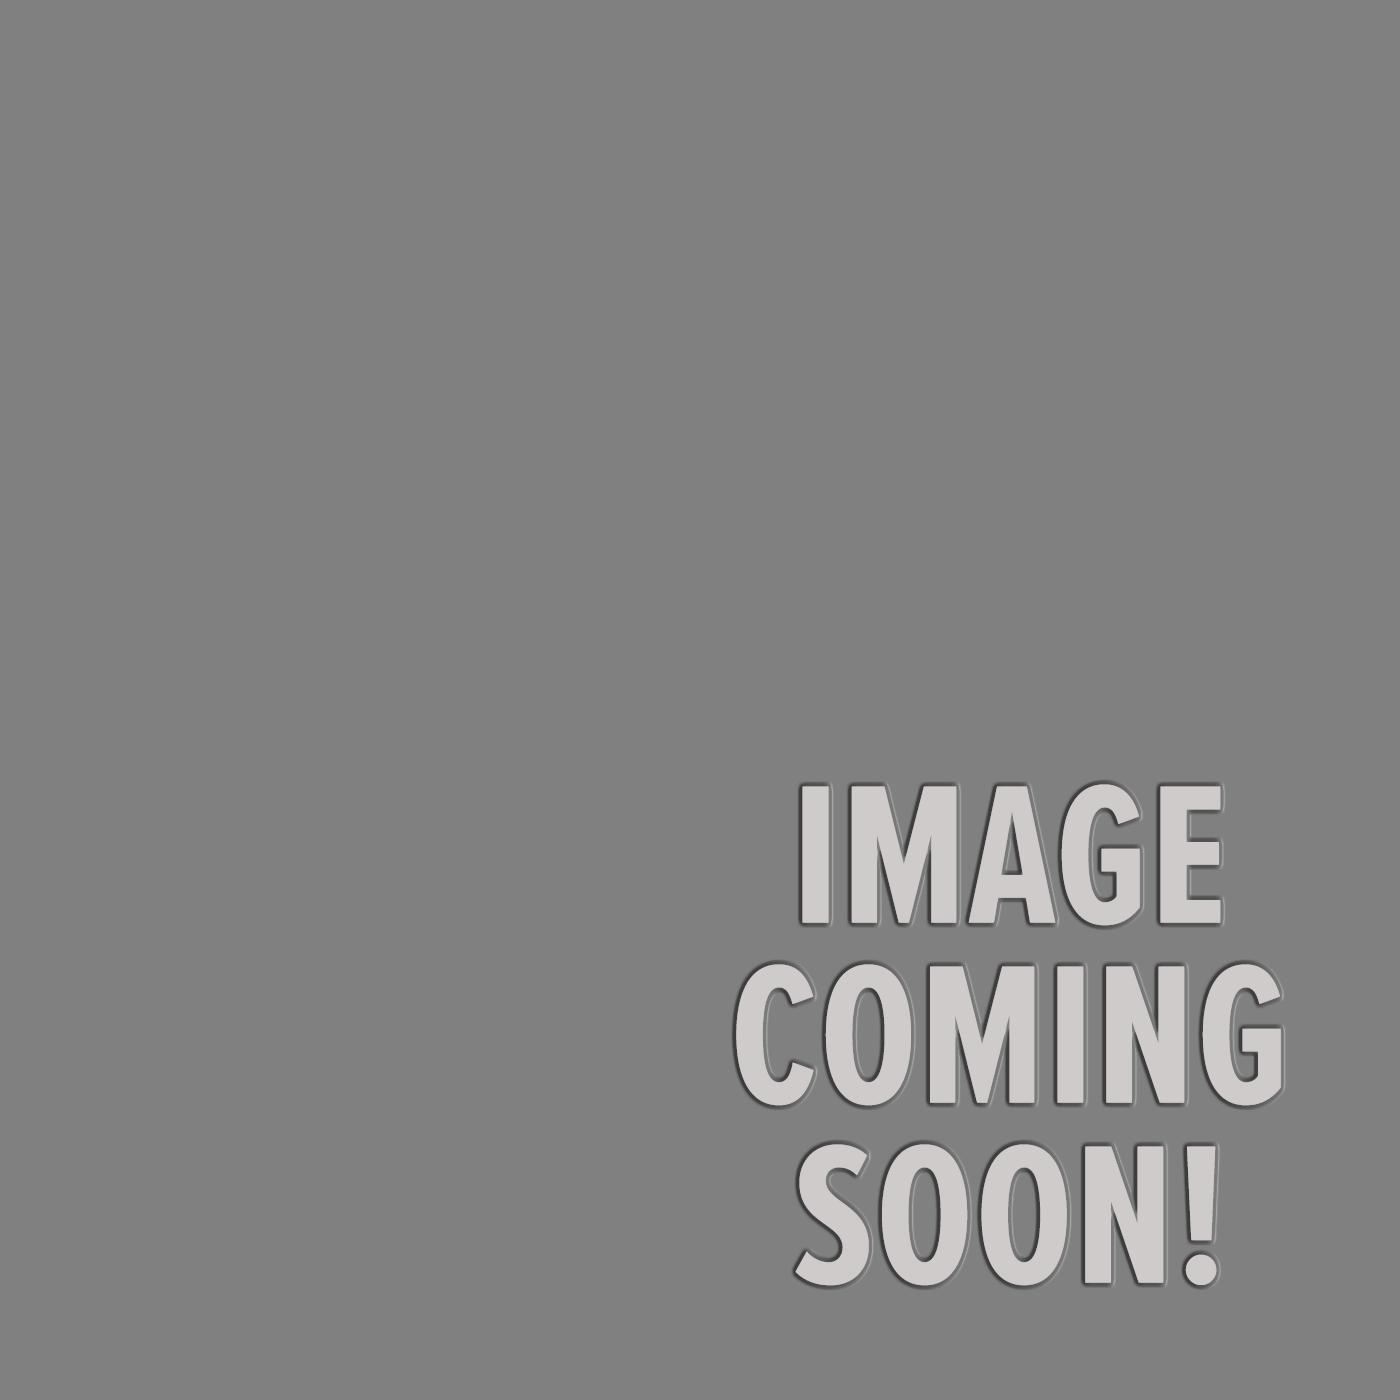 Image for MK0112010 Black Dome Knobs (Set of 2) from SamAsh